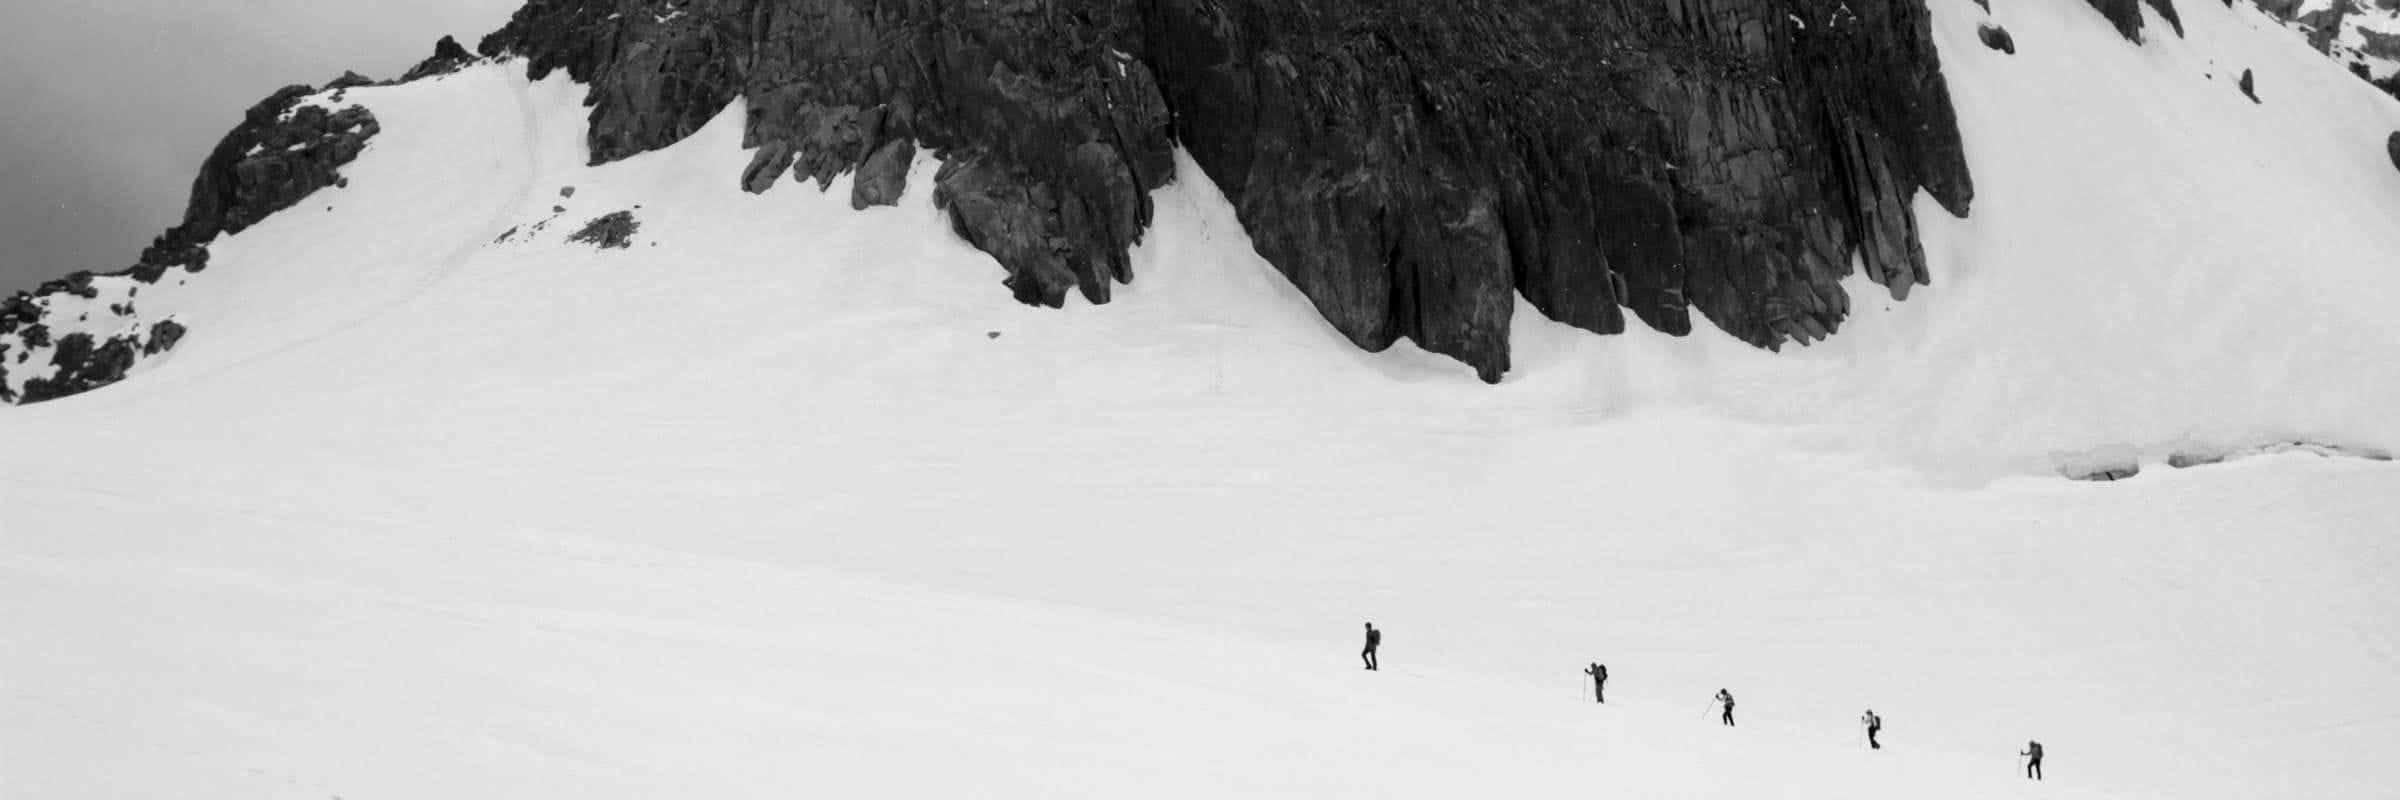 Arc'teryx, Black Diamond, Helly Hansen, Icebreaker, Kari Traa, Marmot, Mountain Hardwear, Norrona, Patagonia, Smartwool. Superposer ses vêtements pour le plein air